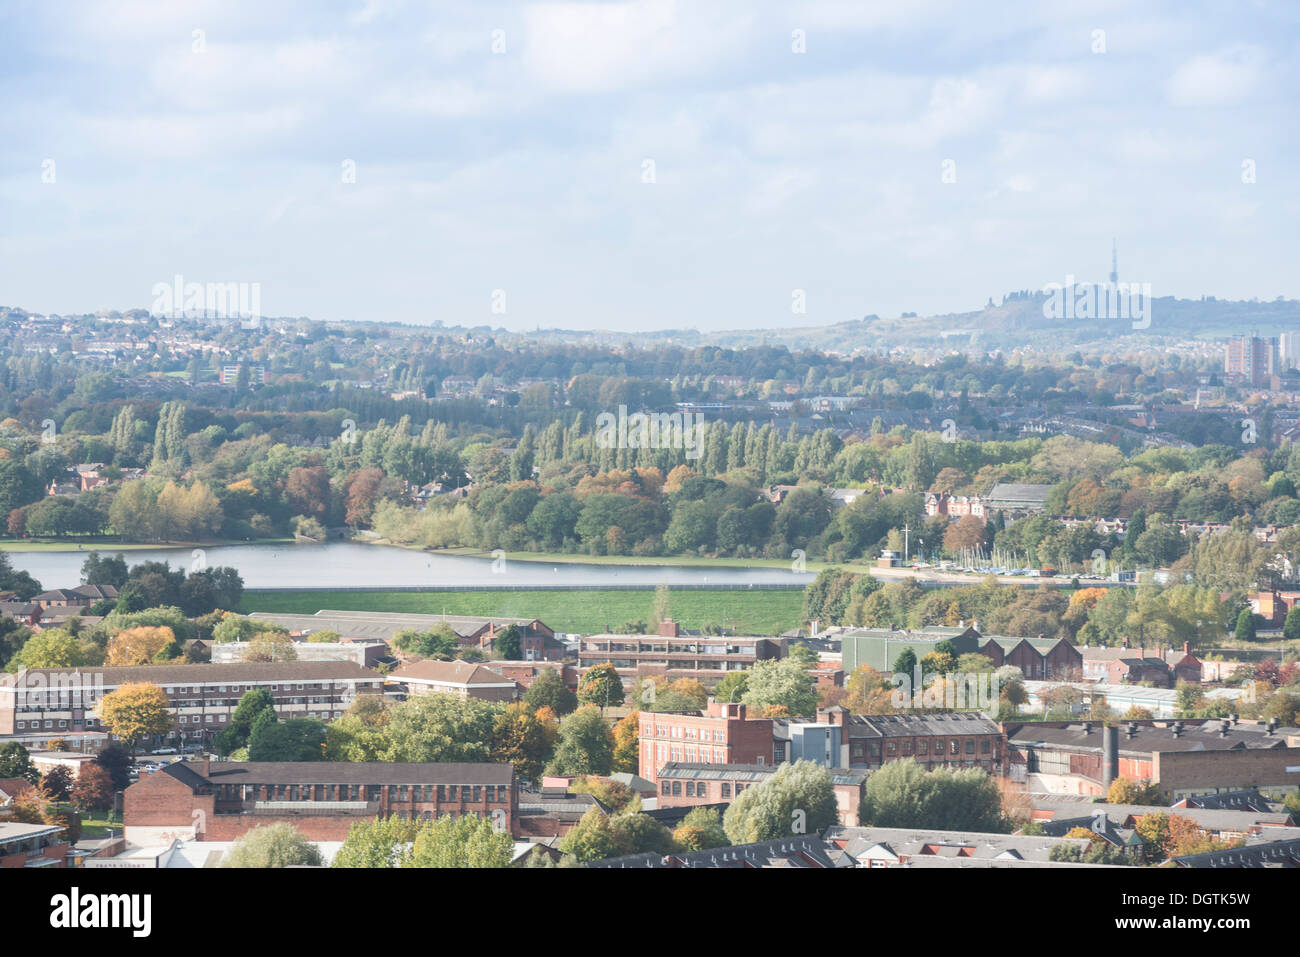 Edgbaston Reservoir, as seen from the city centre, Birmingham, West Midlands, England, UK - Stock Image